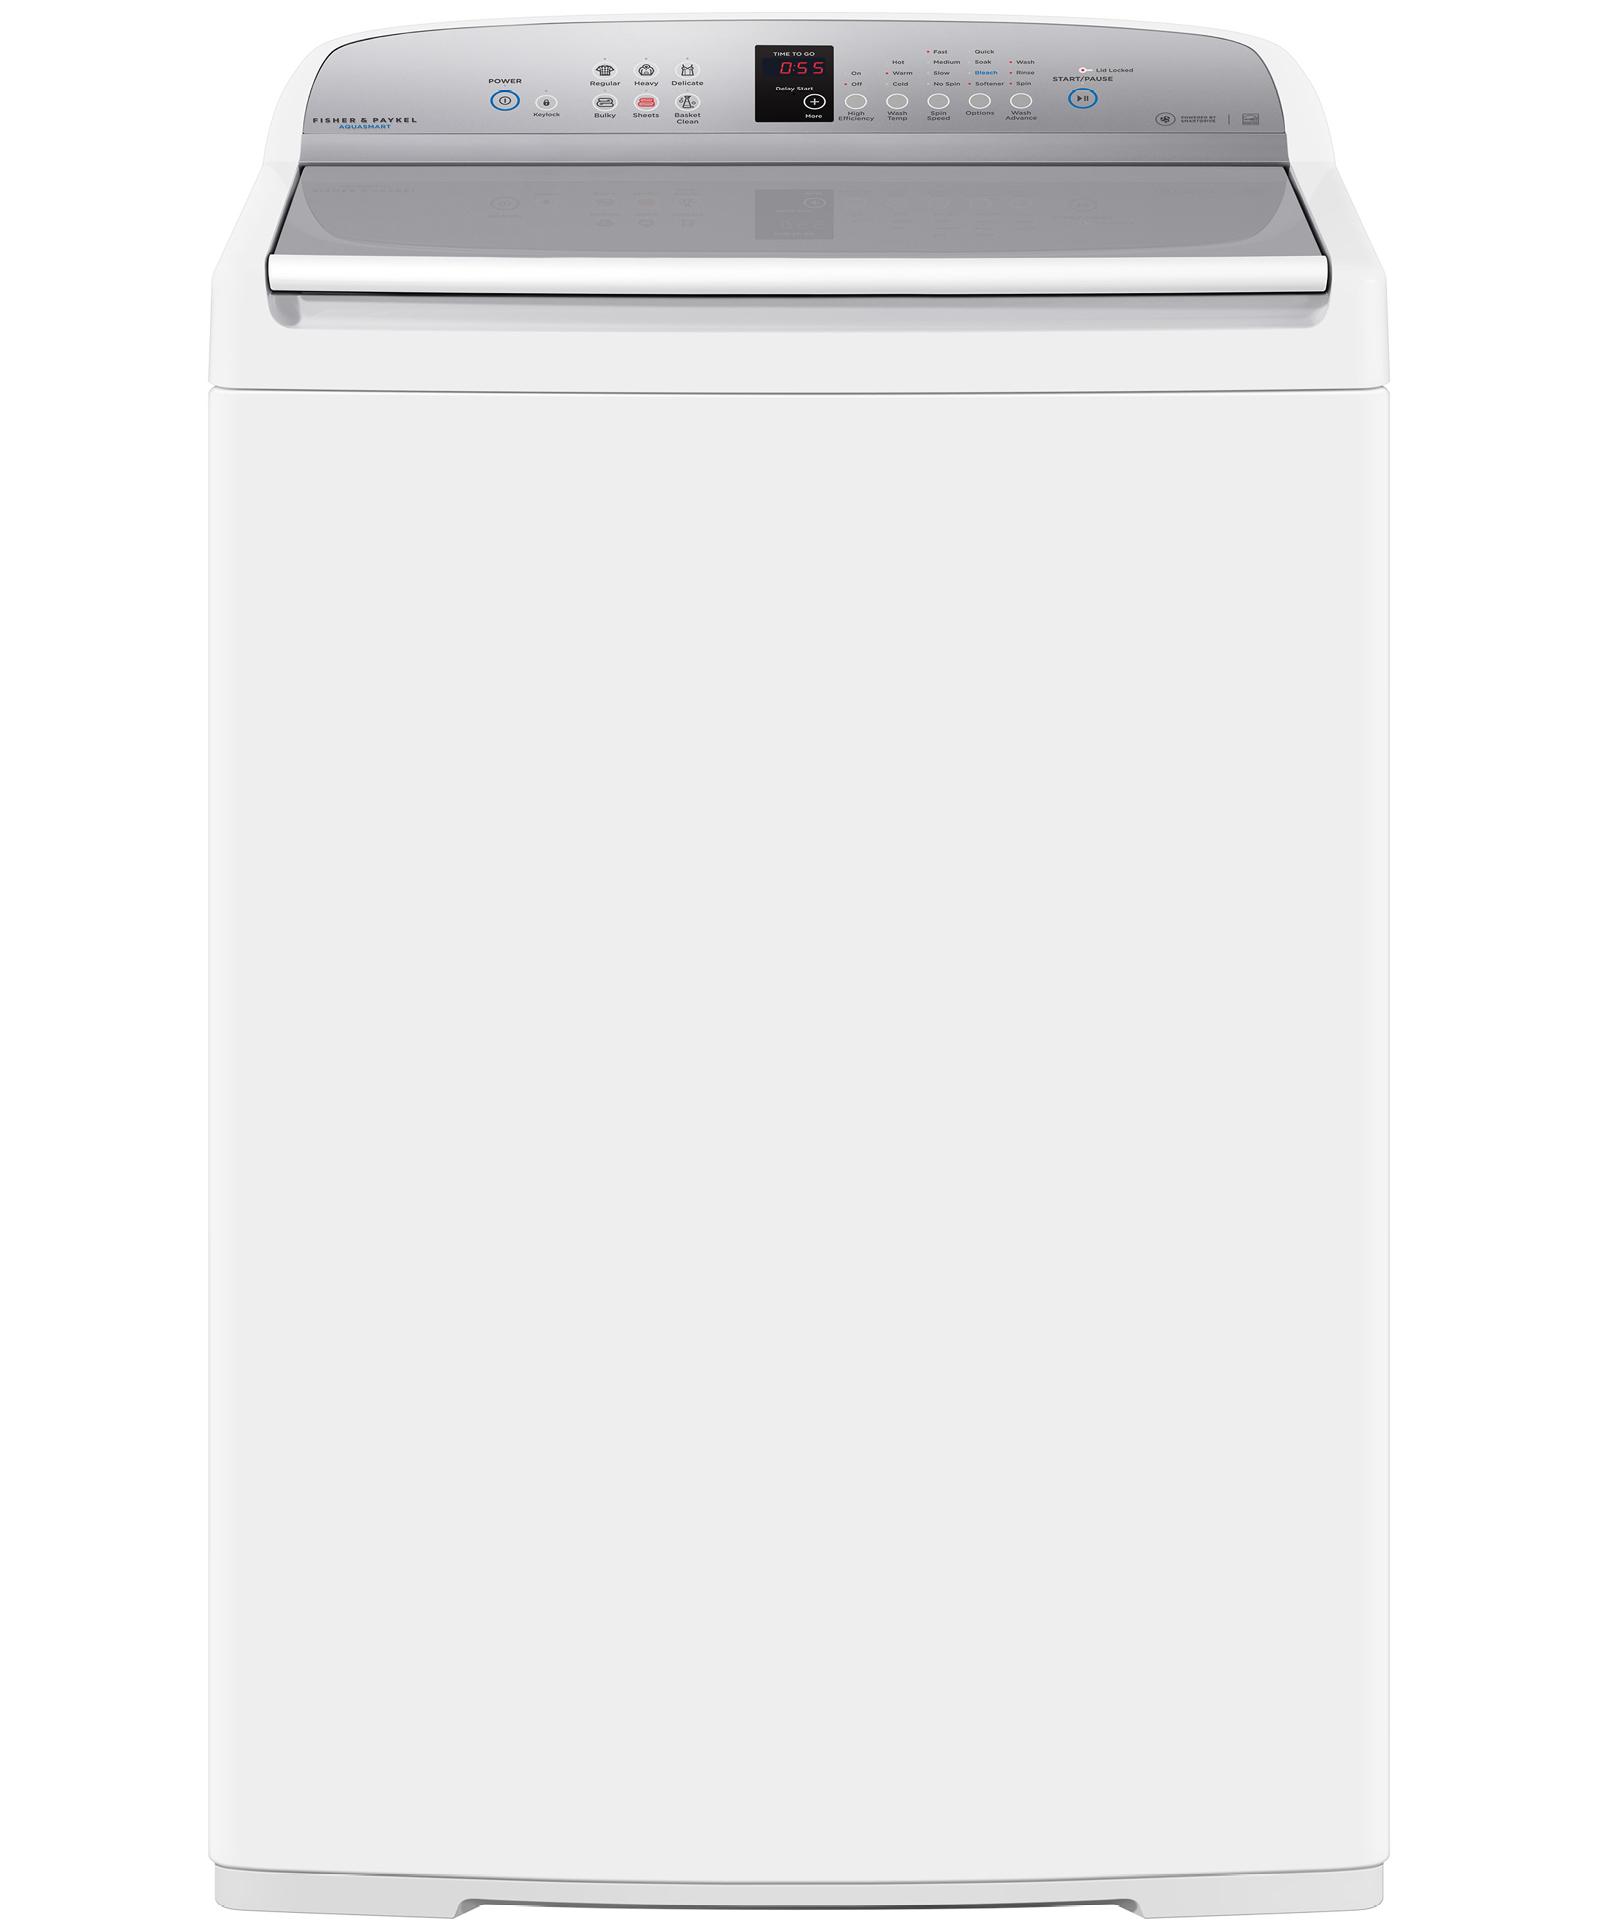 Top Loader Washing Machine, 4 cu ft AquaSmart™ Eco